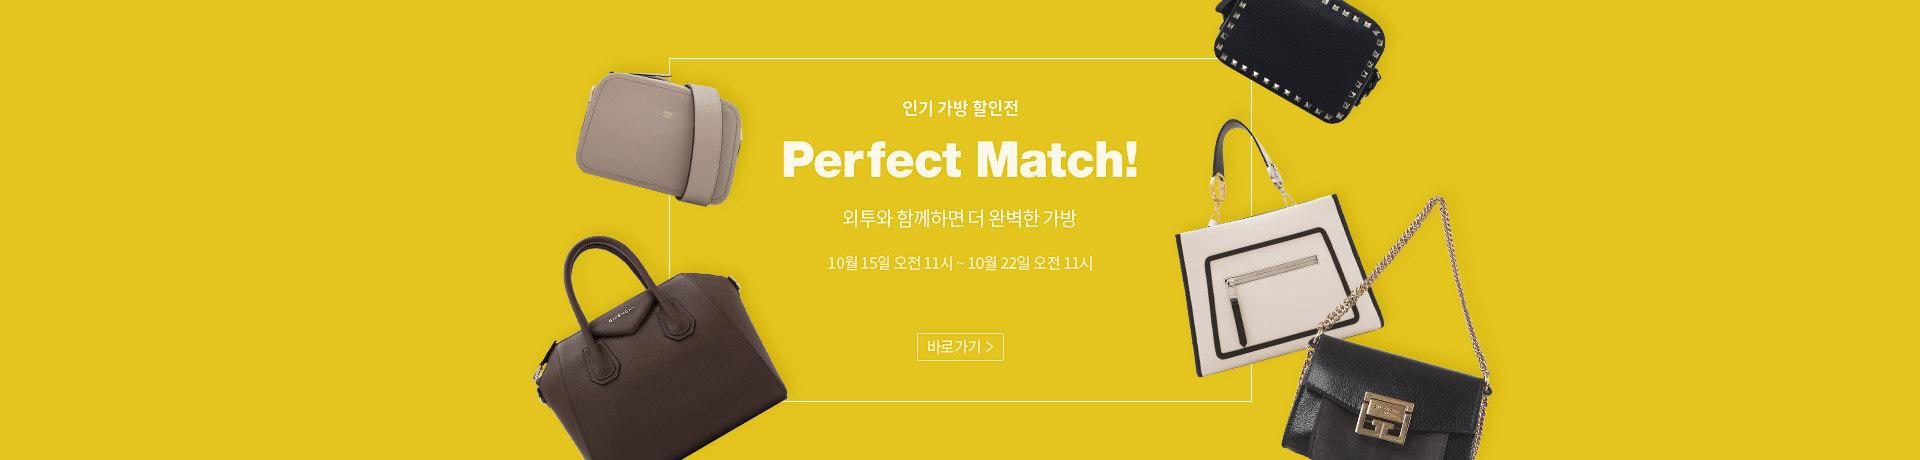 181015_sj_perfect-match__pc-_e3c51f